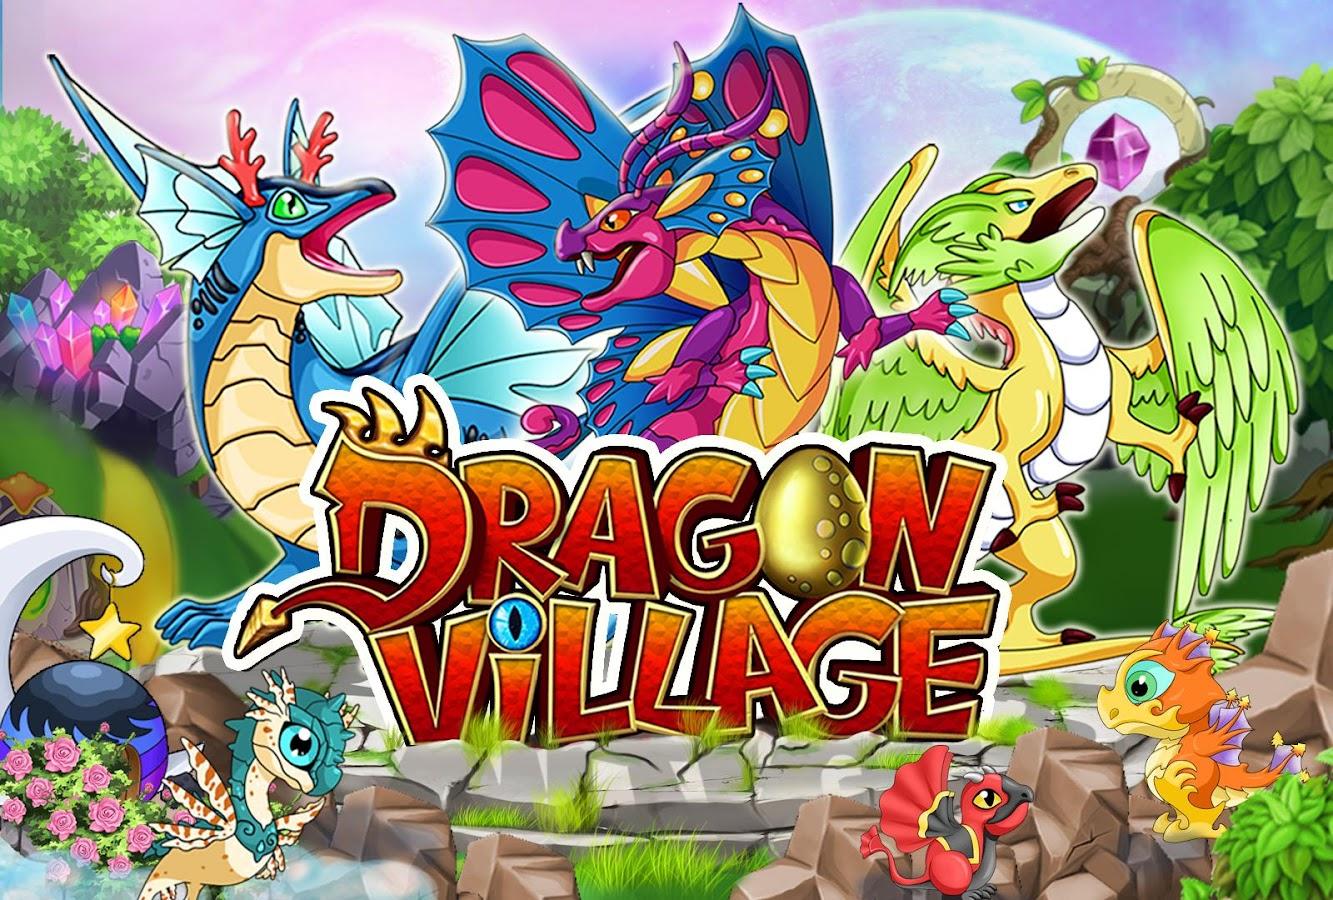 dragon village 2 mod apk unlimited money and gems